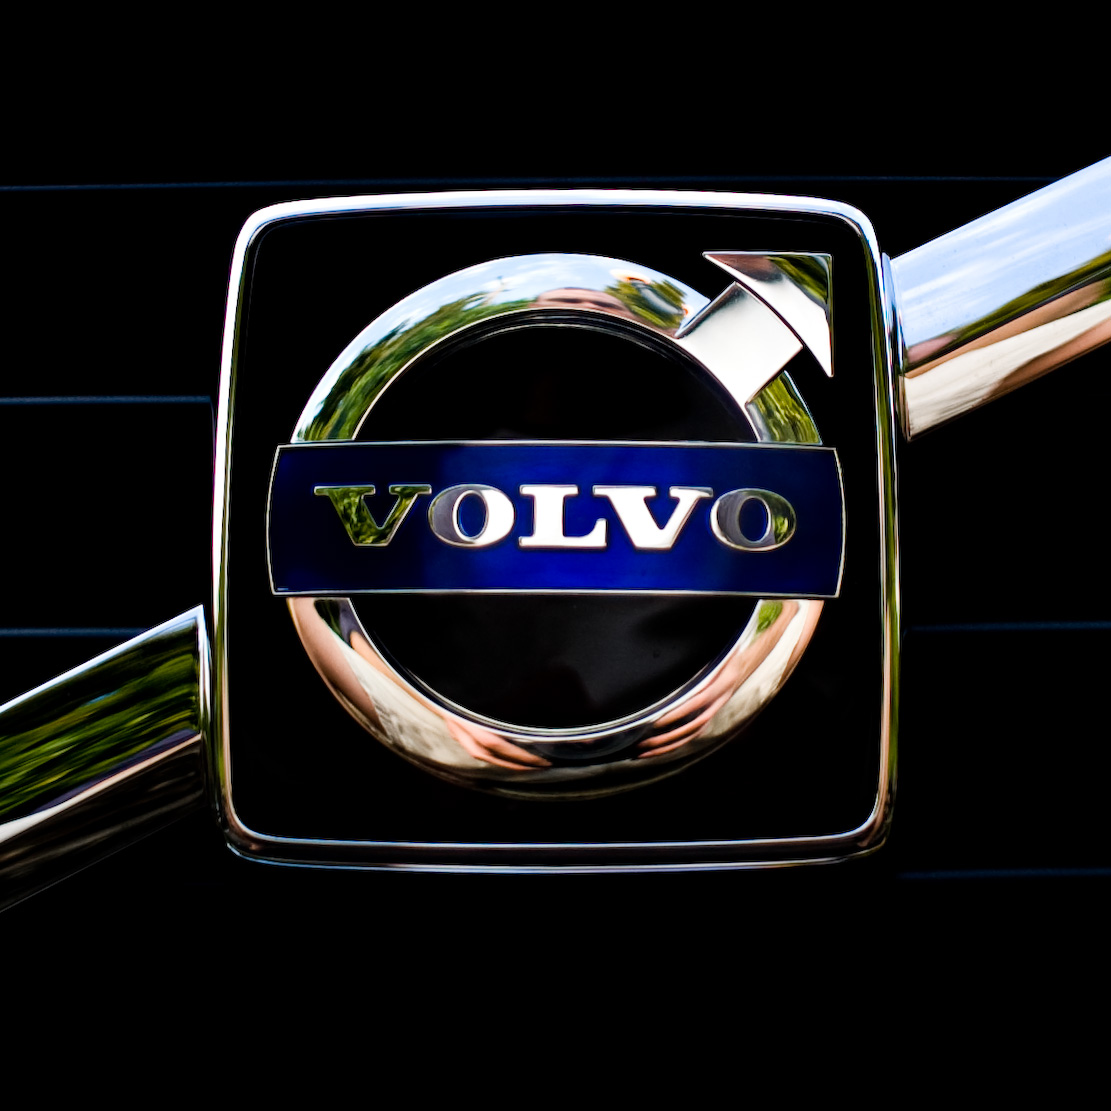 Volvo S60 Grey Car Full Hd Wallpaper: A Photo On Flickriver